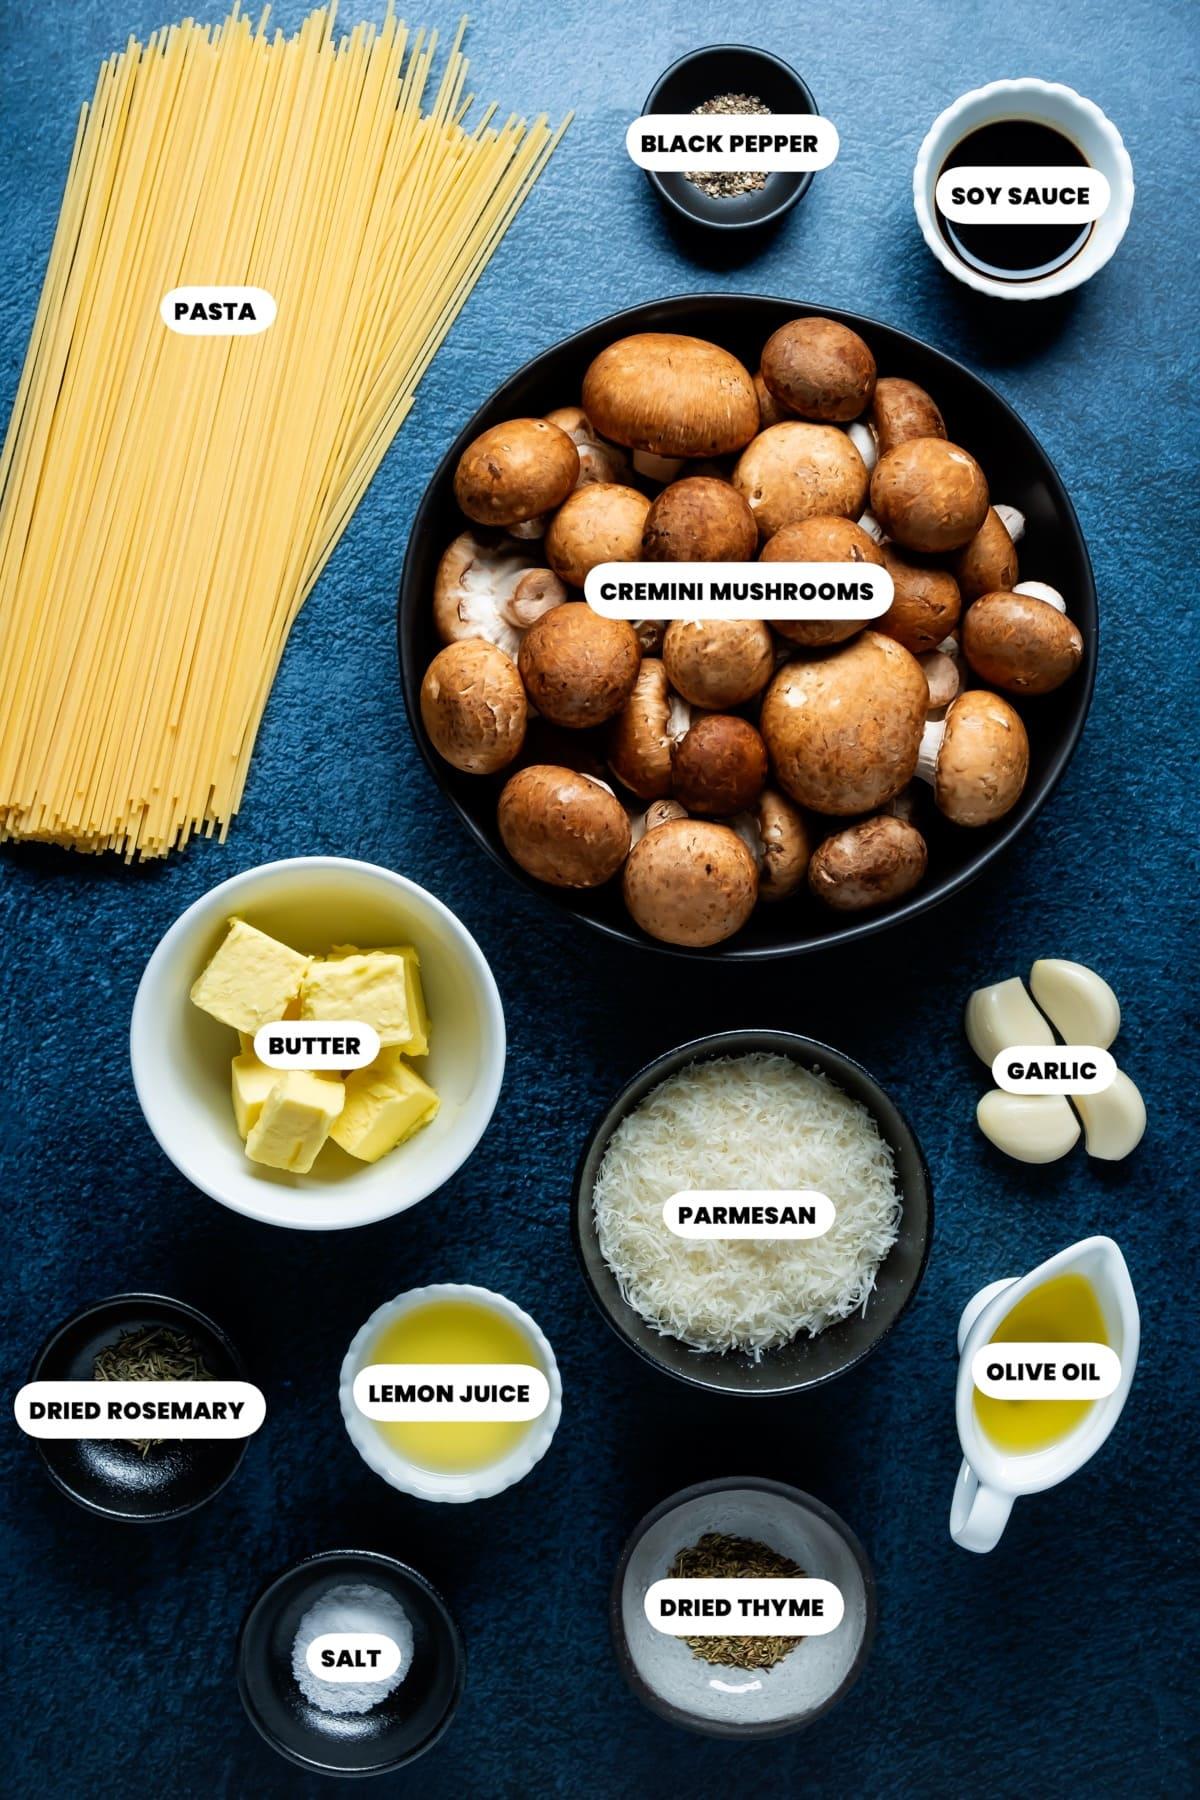 Photo of the ingredients needed to make mushroom pasta.